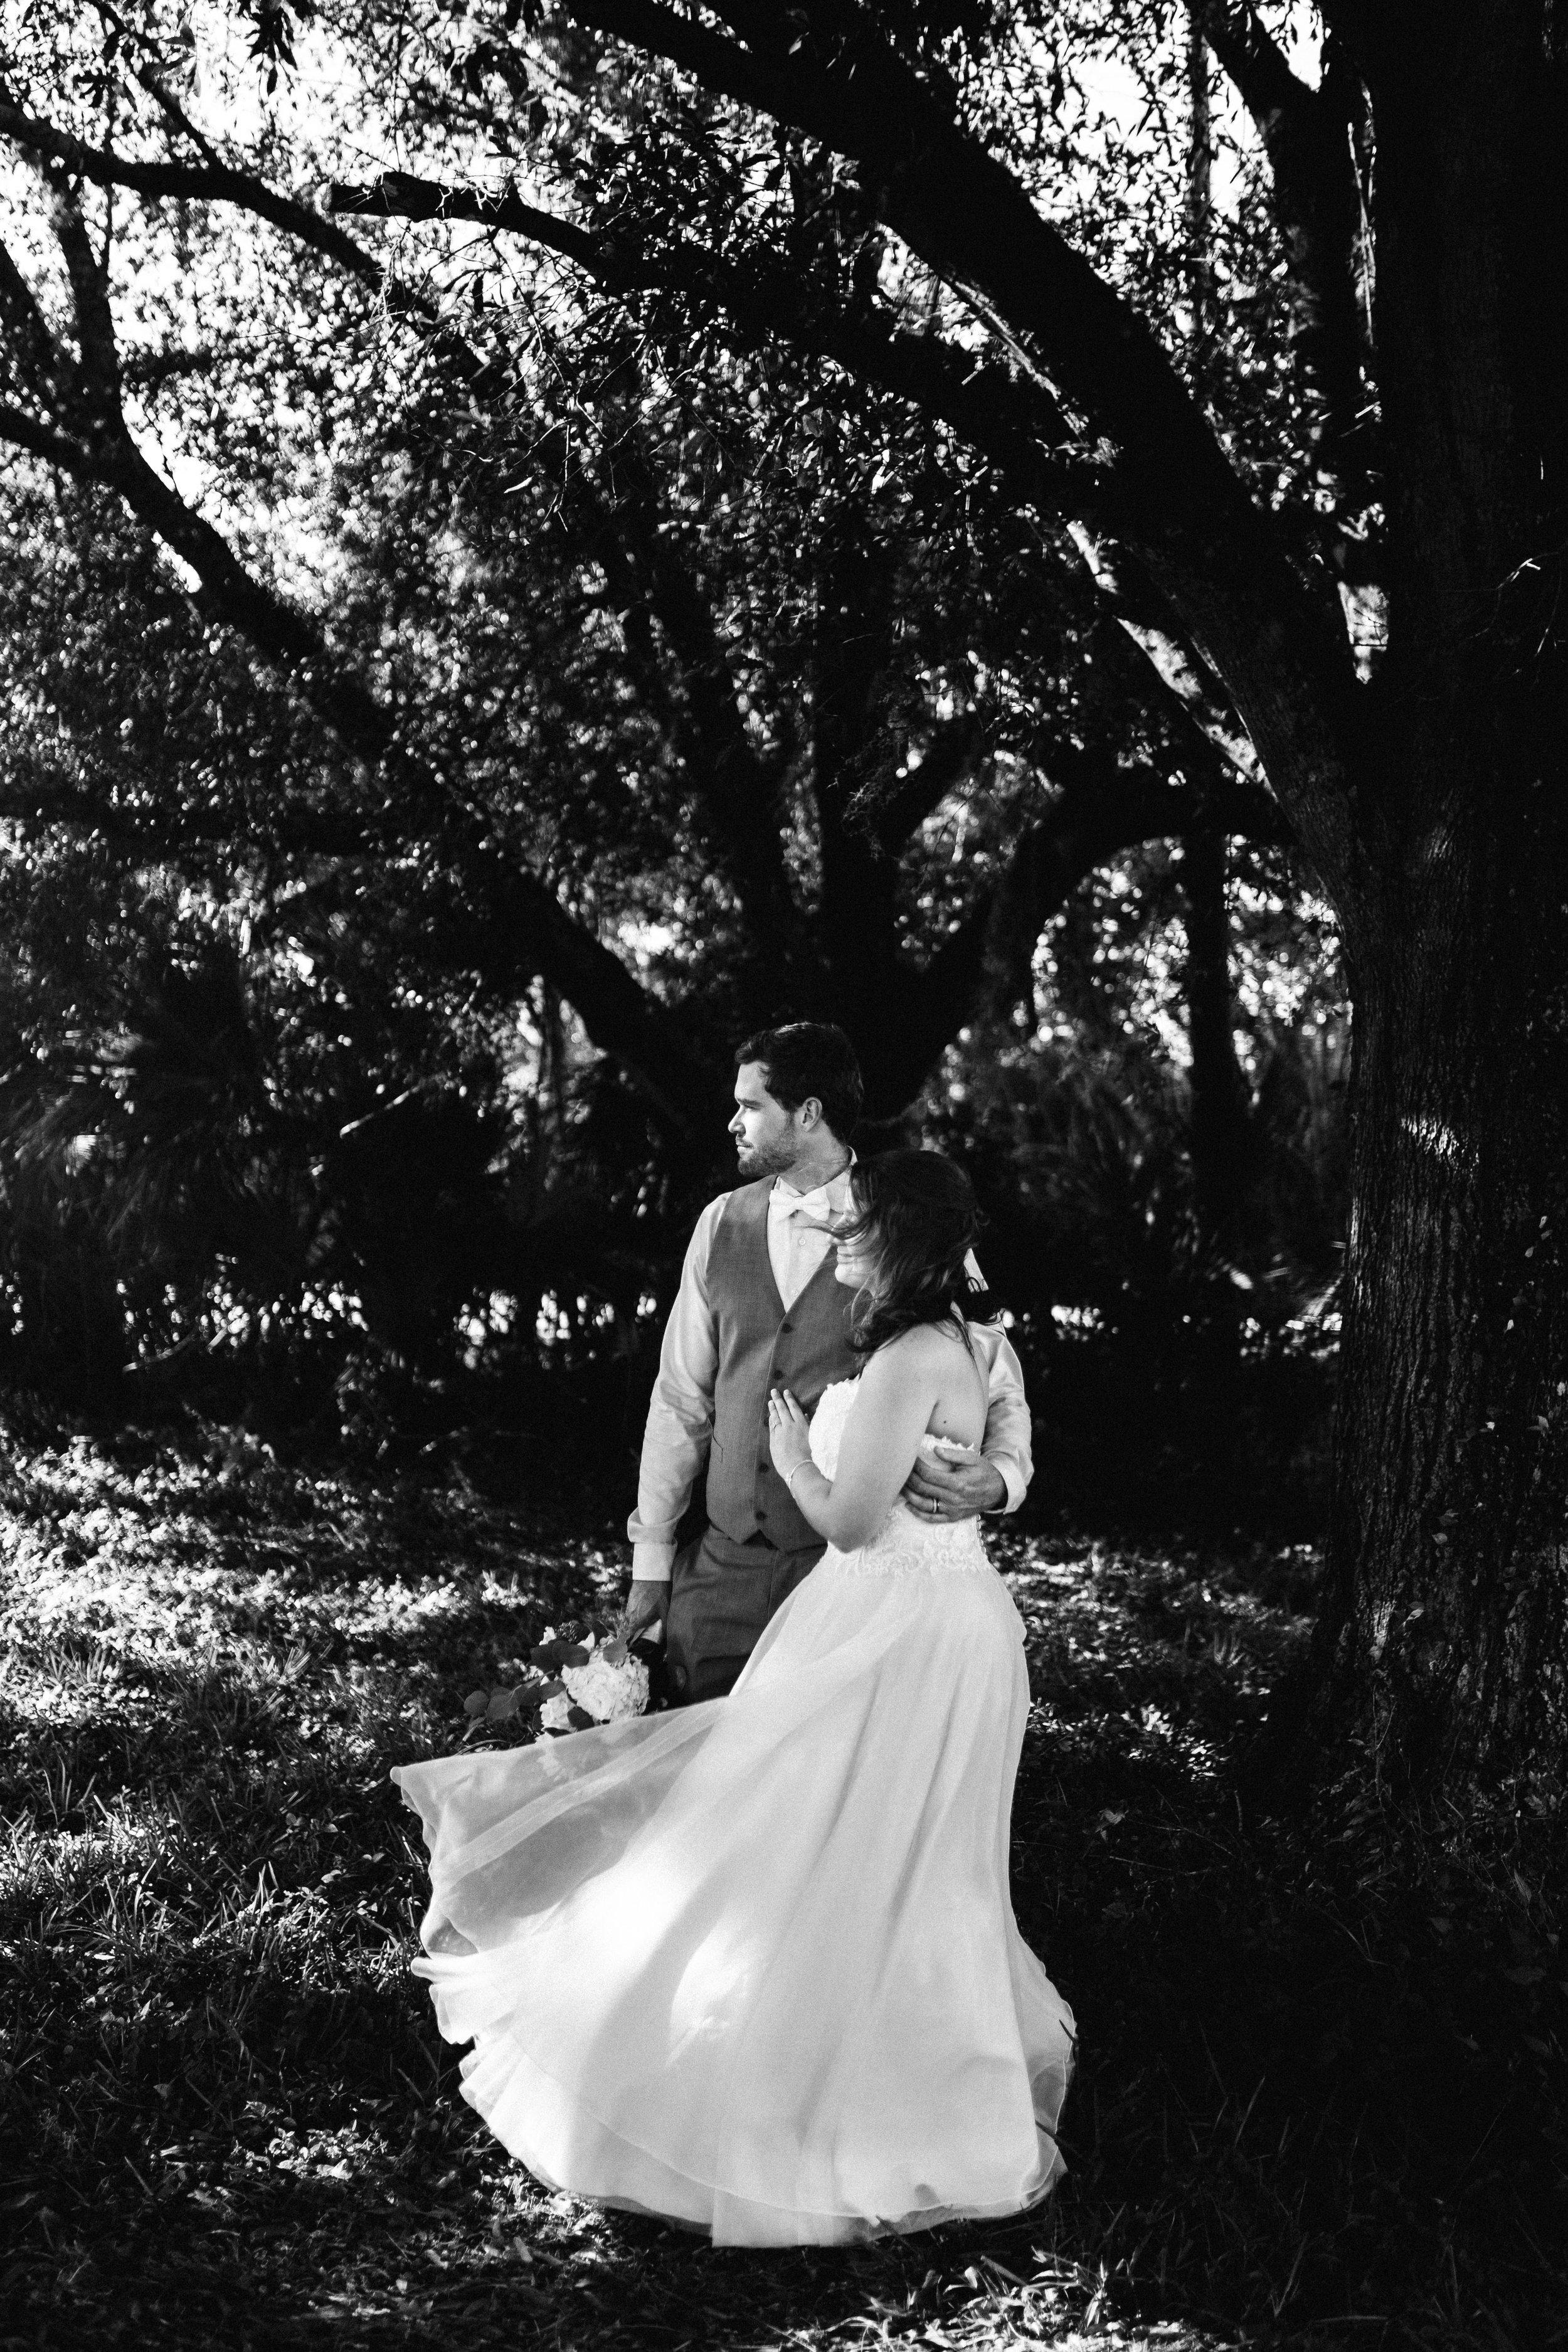 2017.10.14 Samantha and Matthew Crabtree Sarasota Wedding (372 of 708).jpg